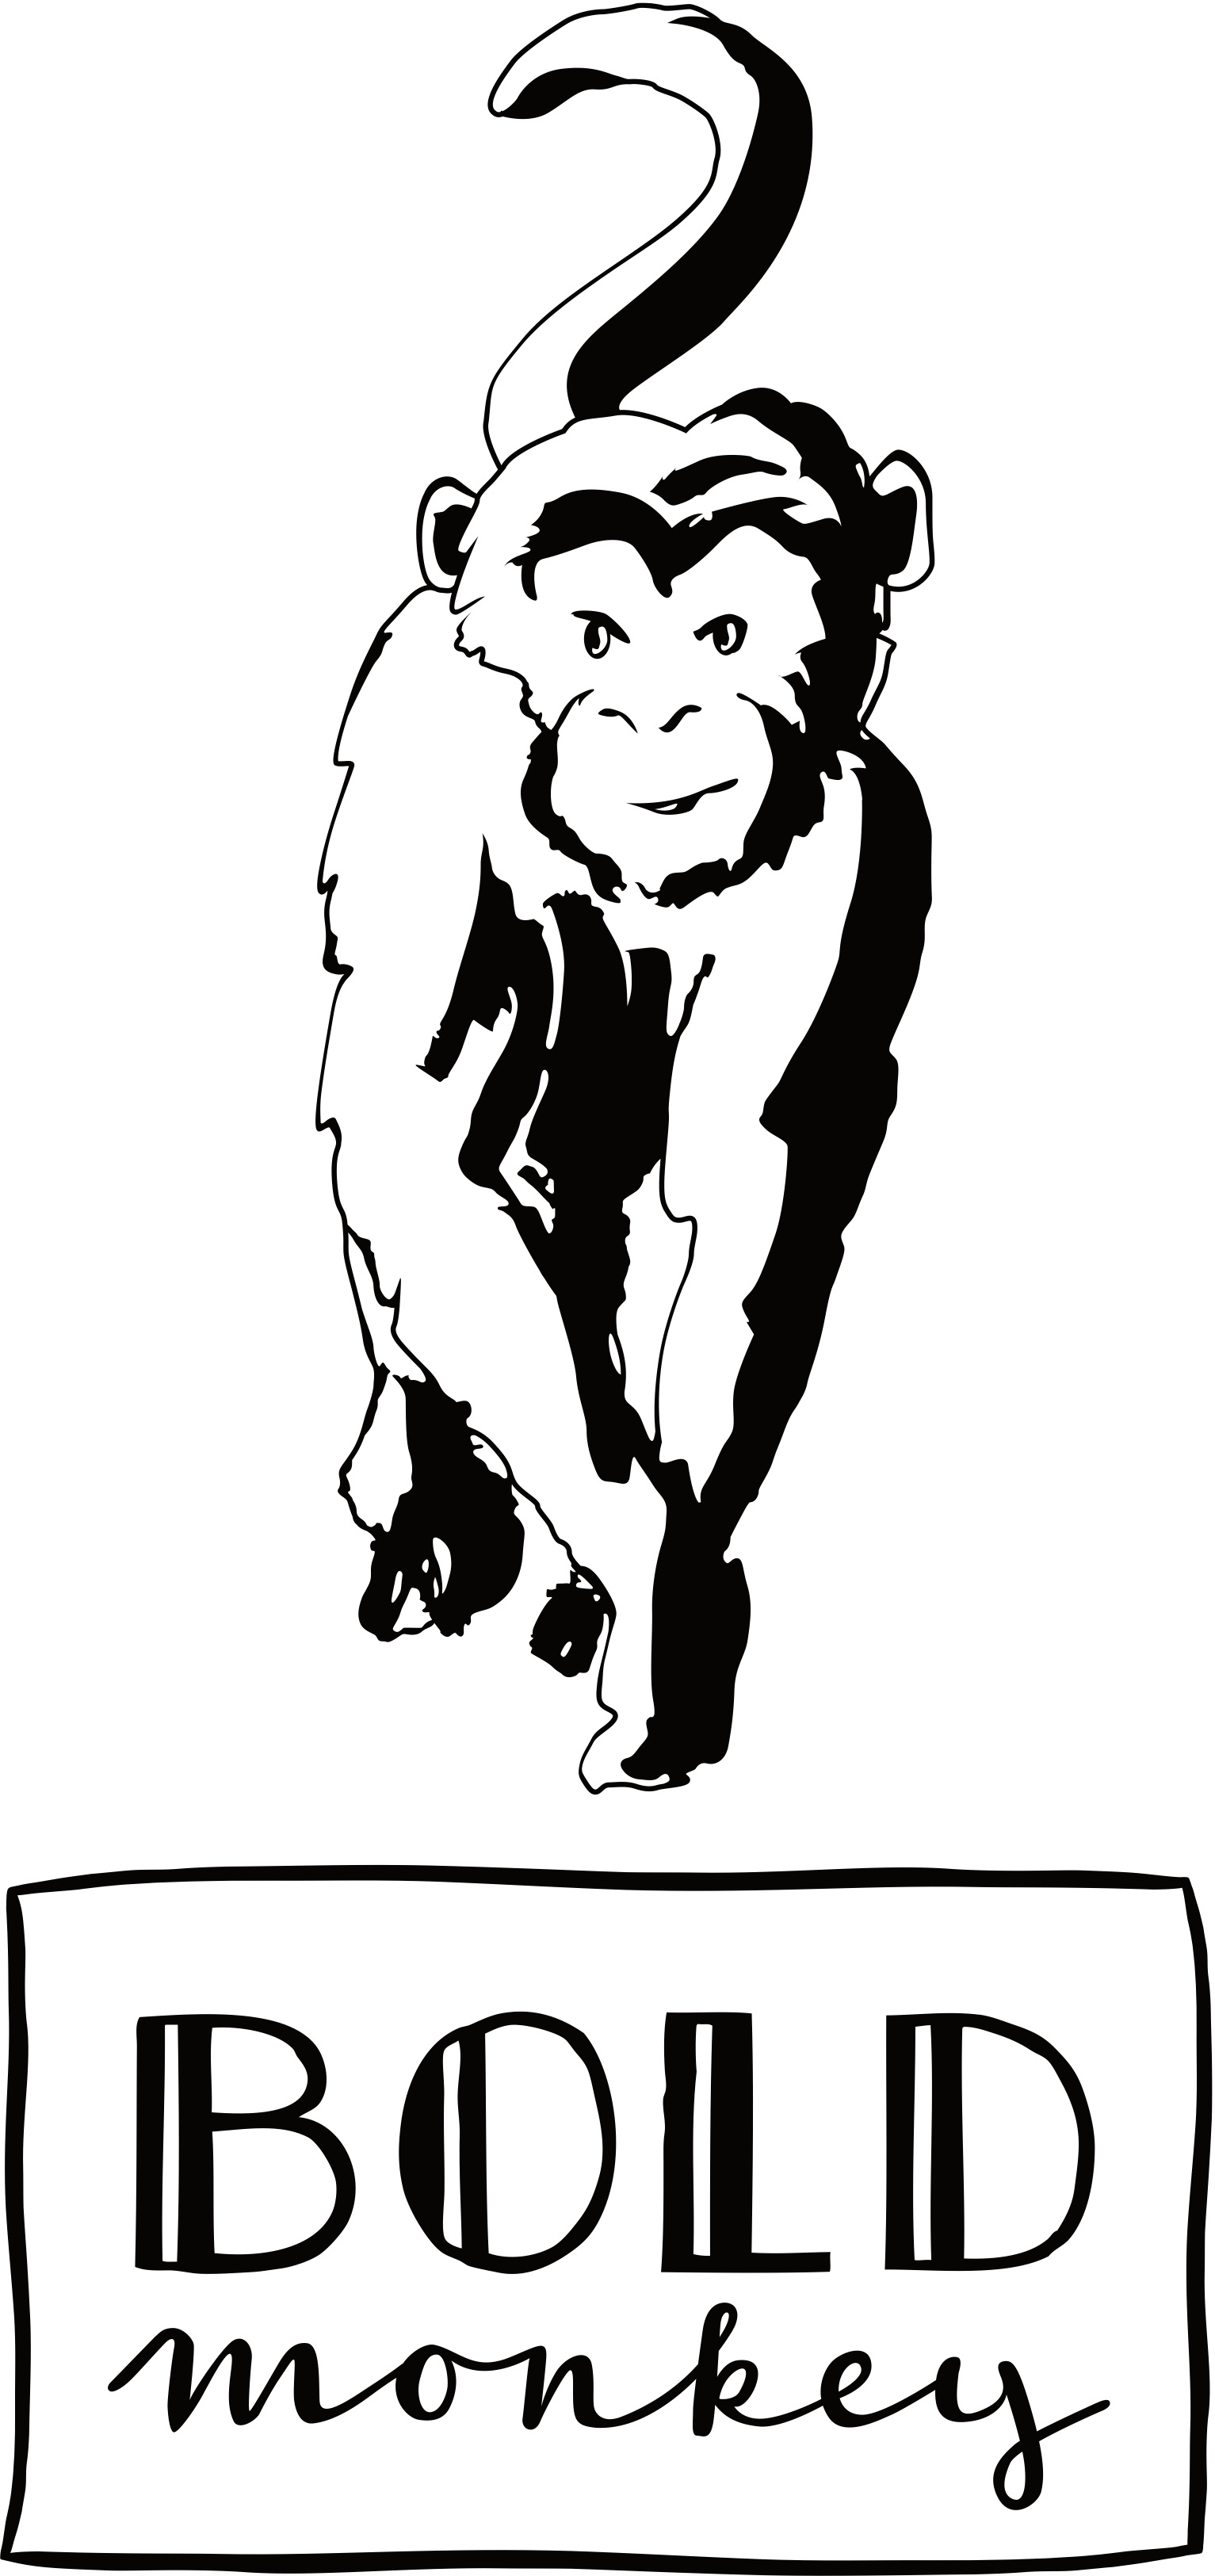 Bold Monkey i am not a macaron lage barkruk counter kookeiland kruk velvet oker geel gouden poten vooraanzicht